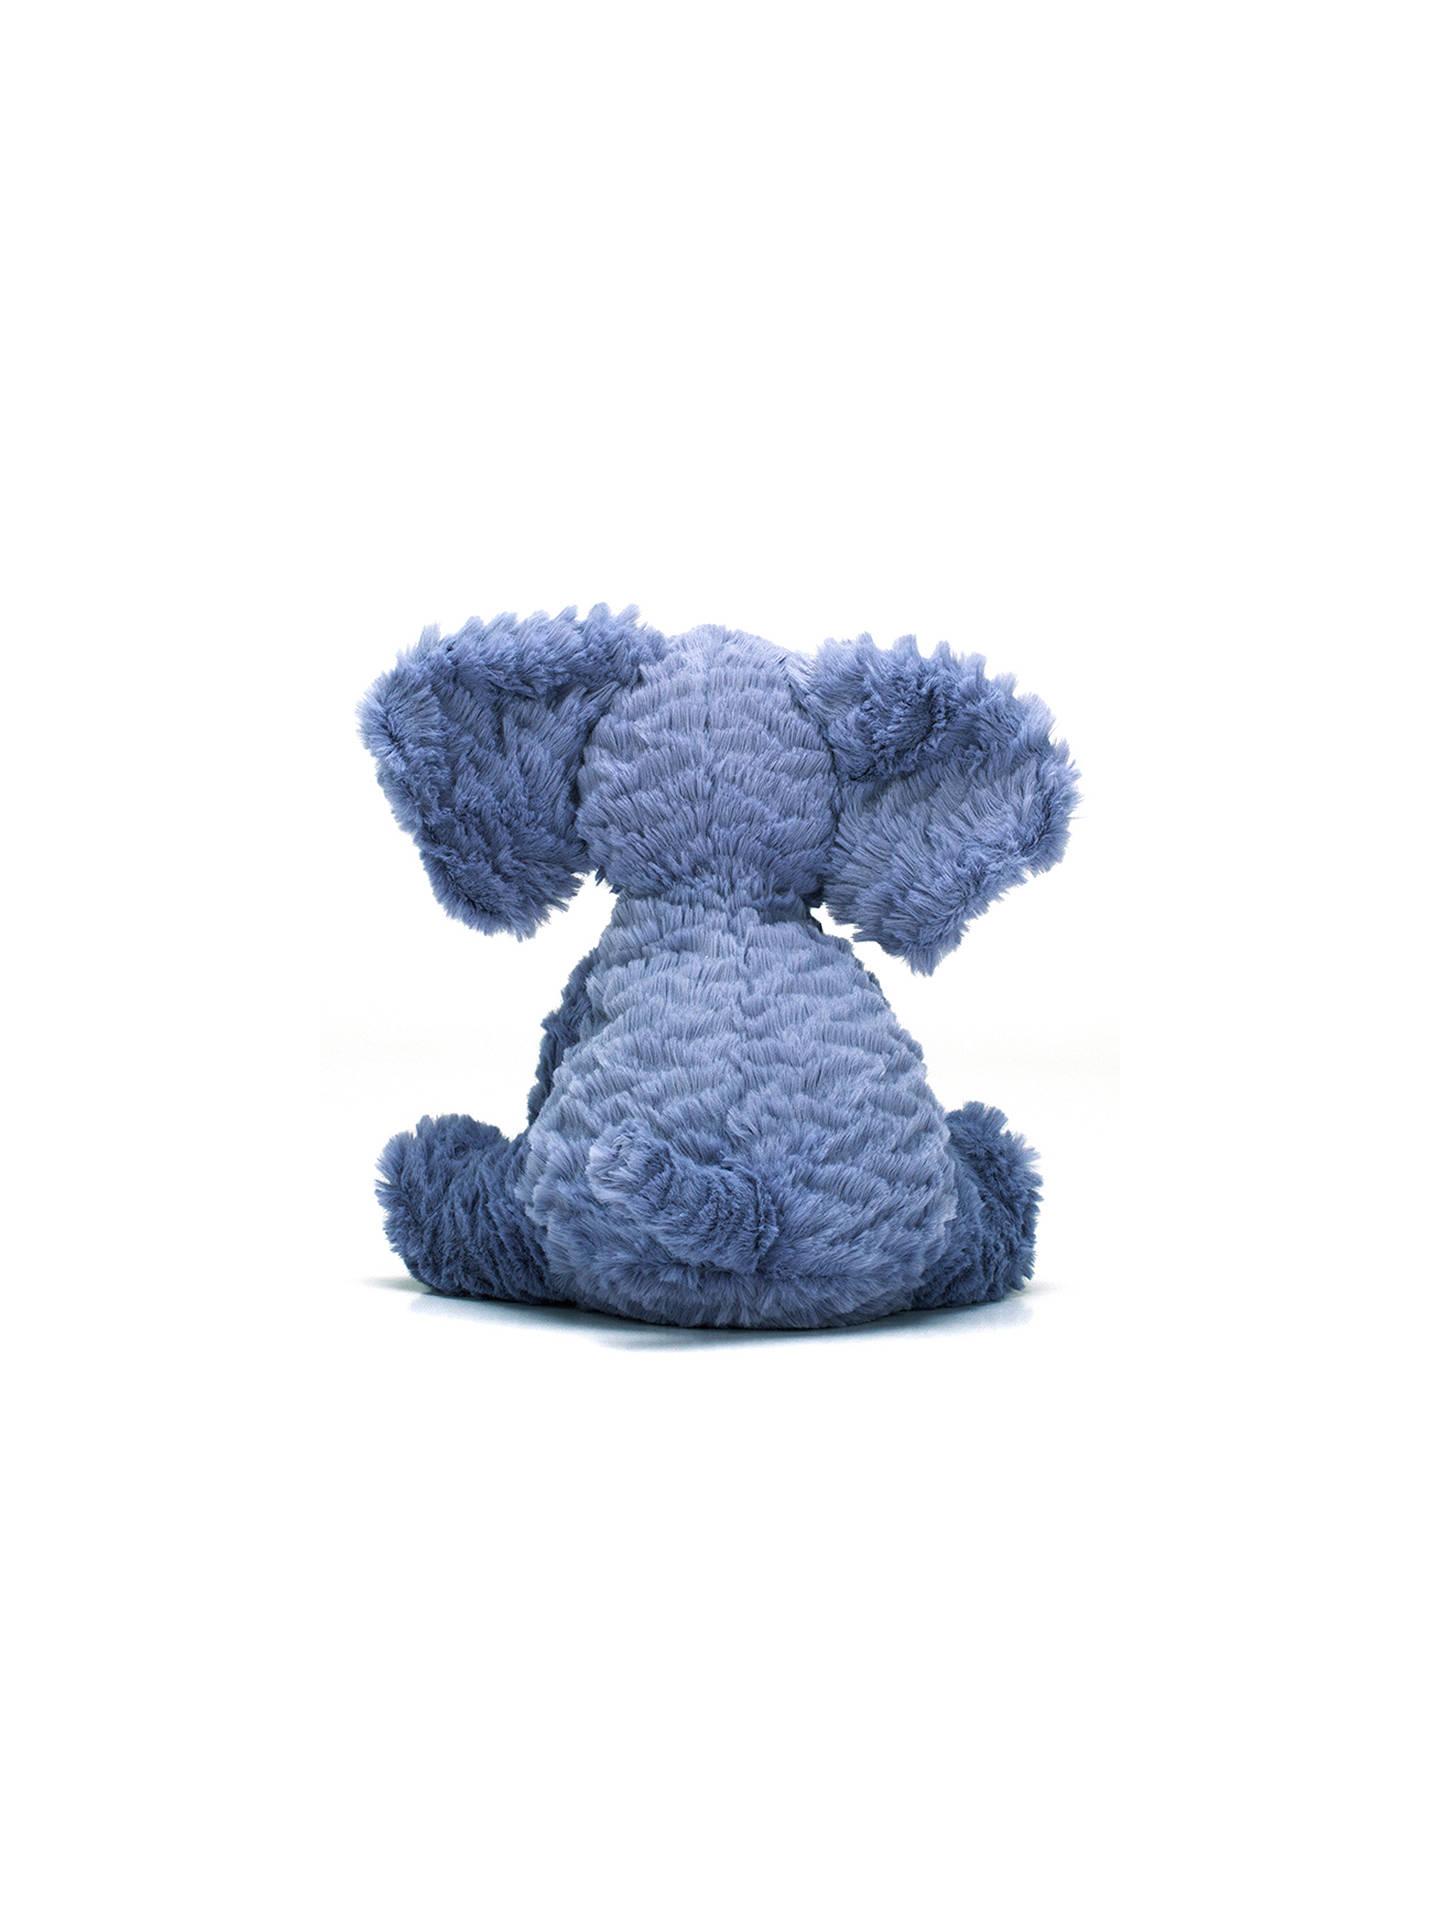 KOALA ANIMAL PERSONALISED CAR SUN SHADE Window Kids baby birthday gift present